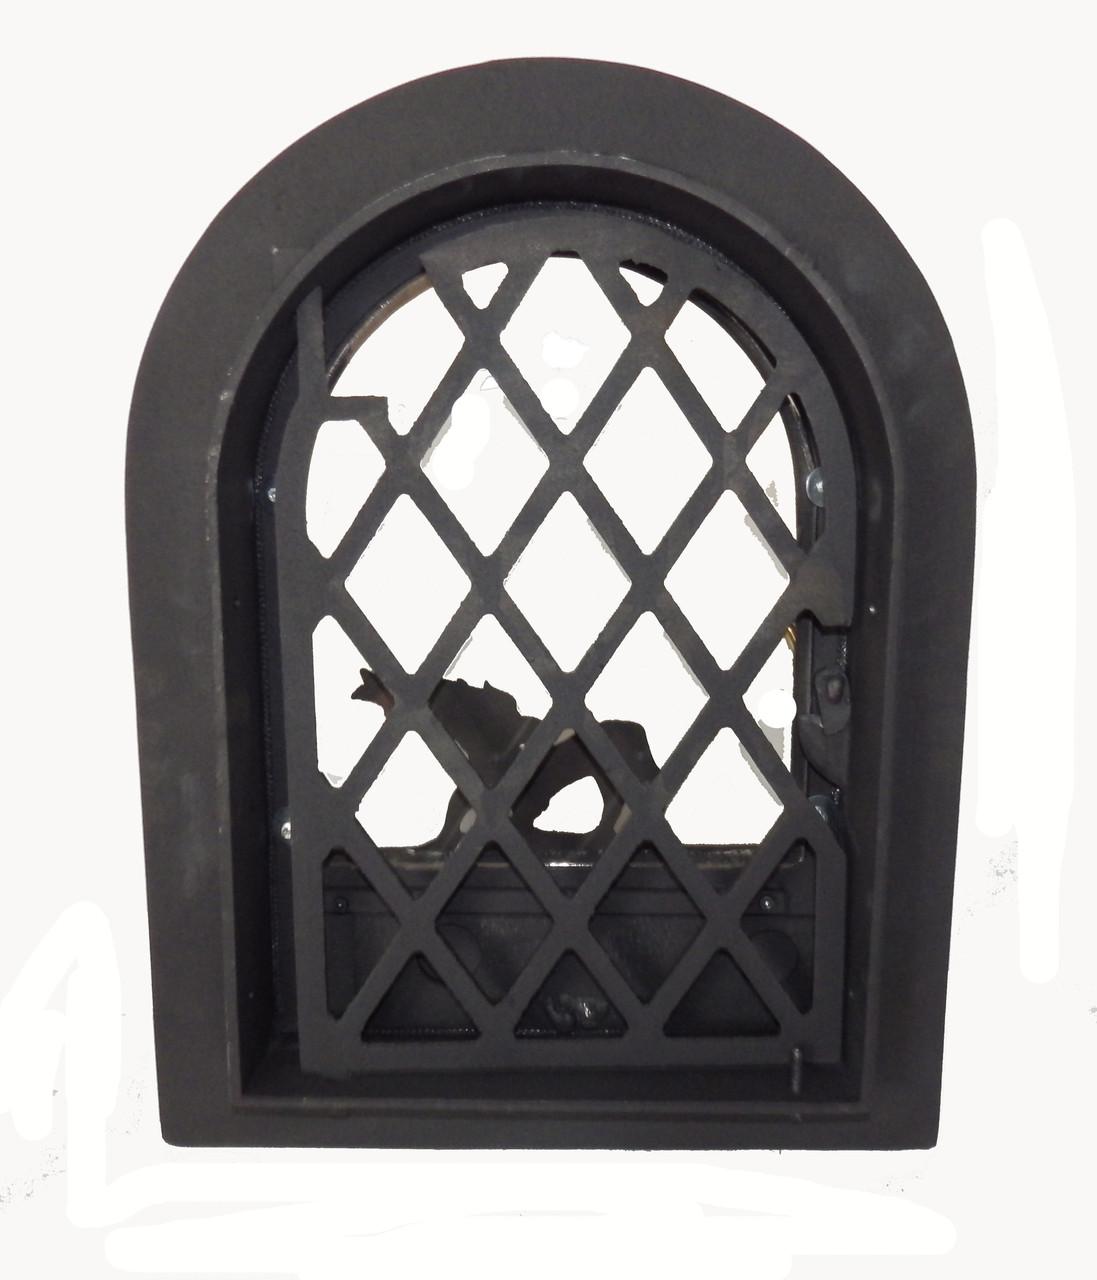 Чугунная дверка для печи со стеклом- VVK 35х47см/27 х 38см